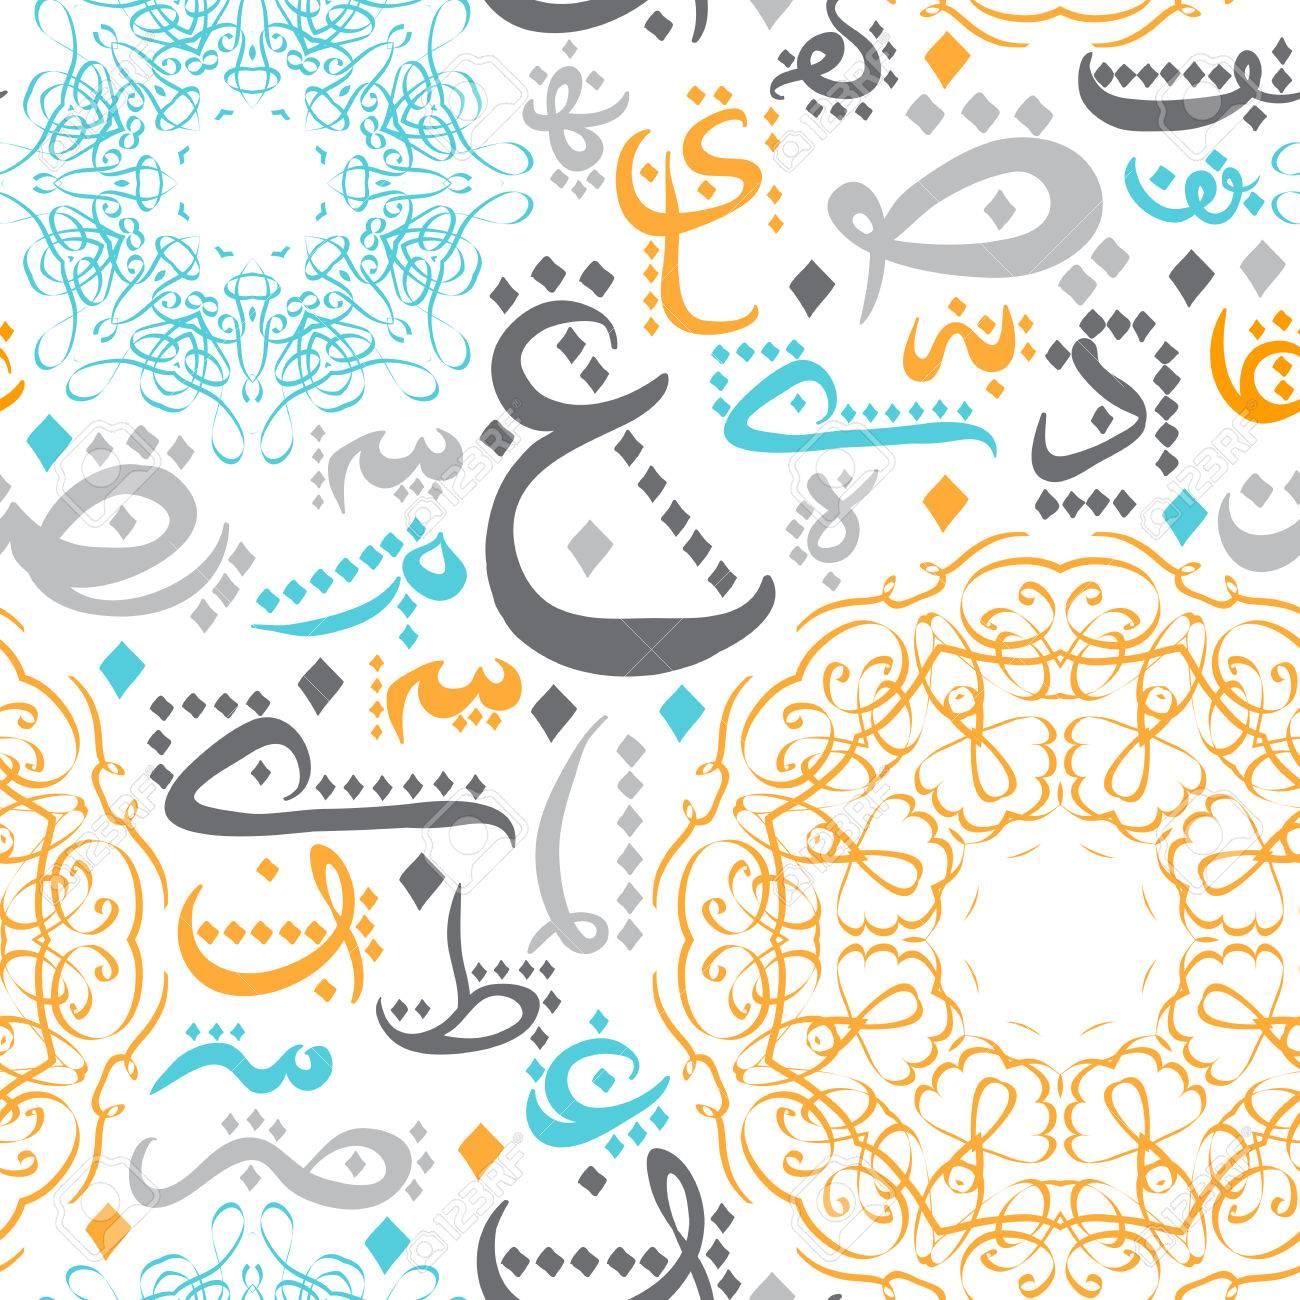 Seamless pattern with Arabic calligraphy and ornate mandala. Concept design for muslim community festival Eid Al Fitr(Eid Mubarak)(Translation: thank god). - 63173460